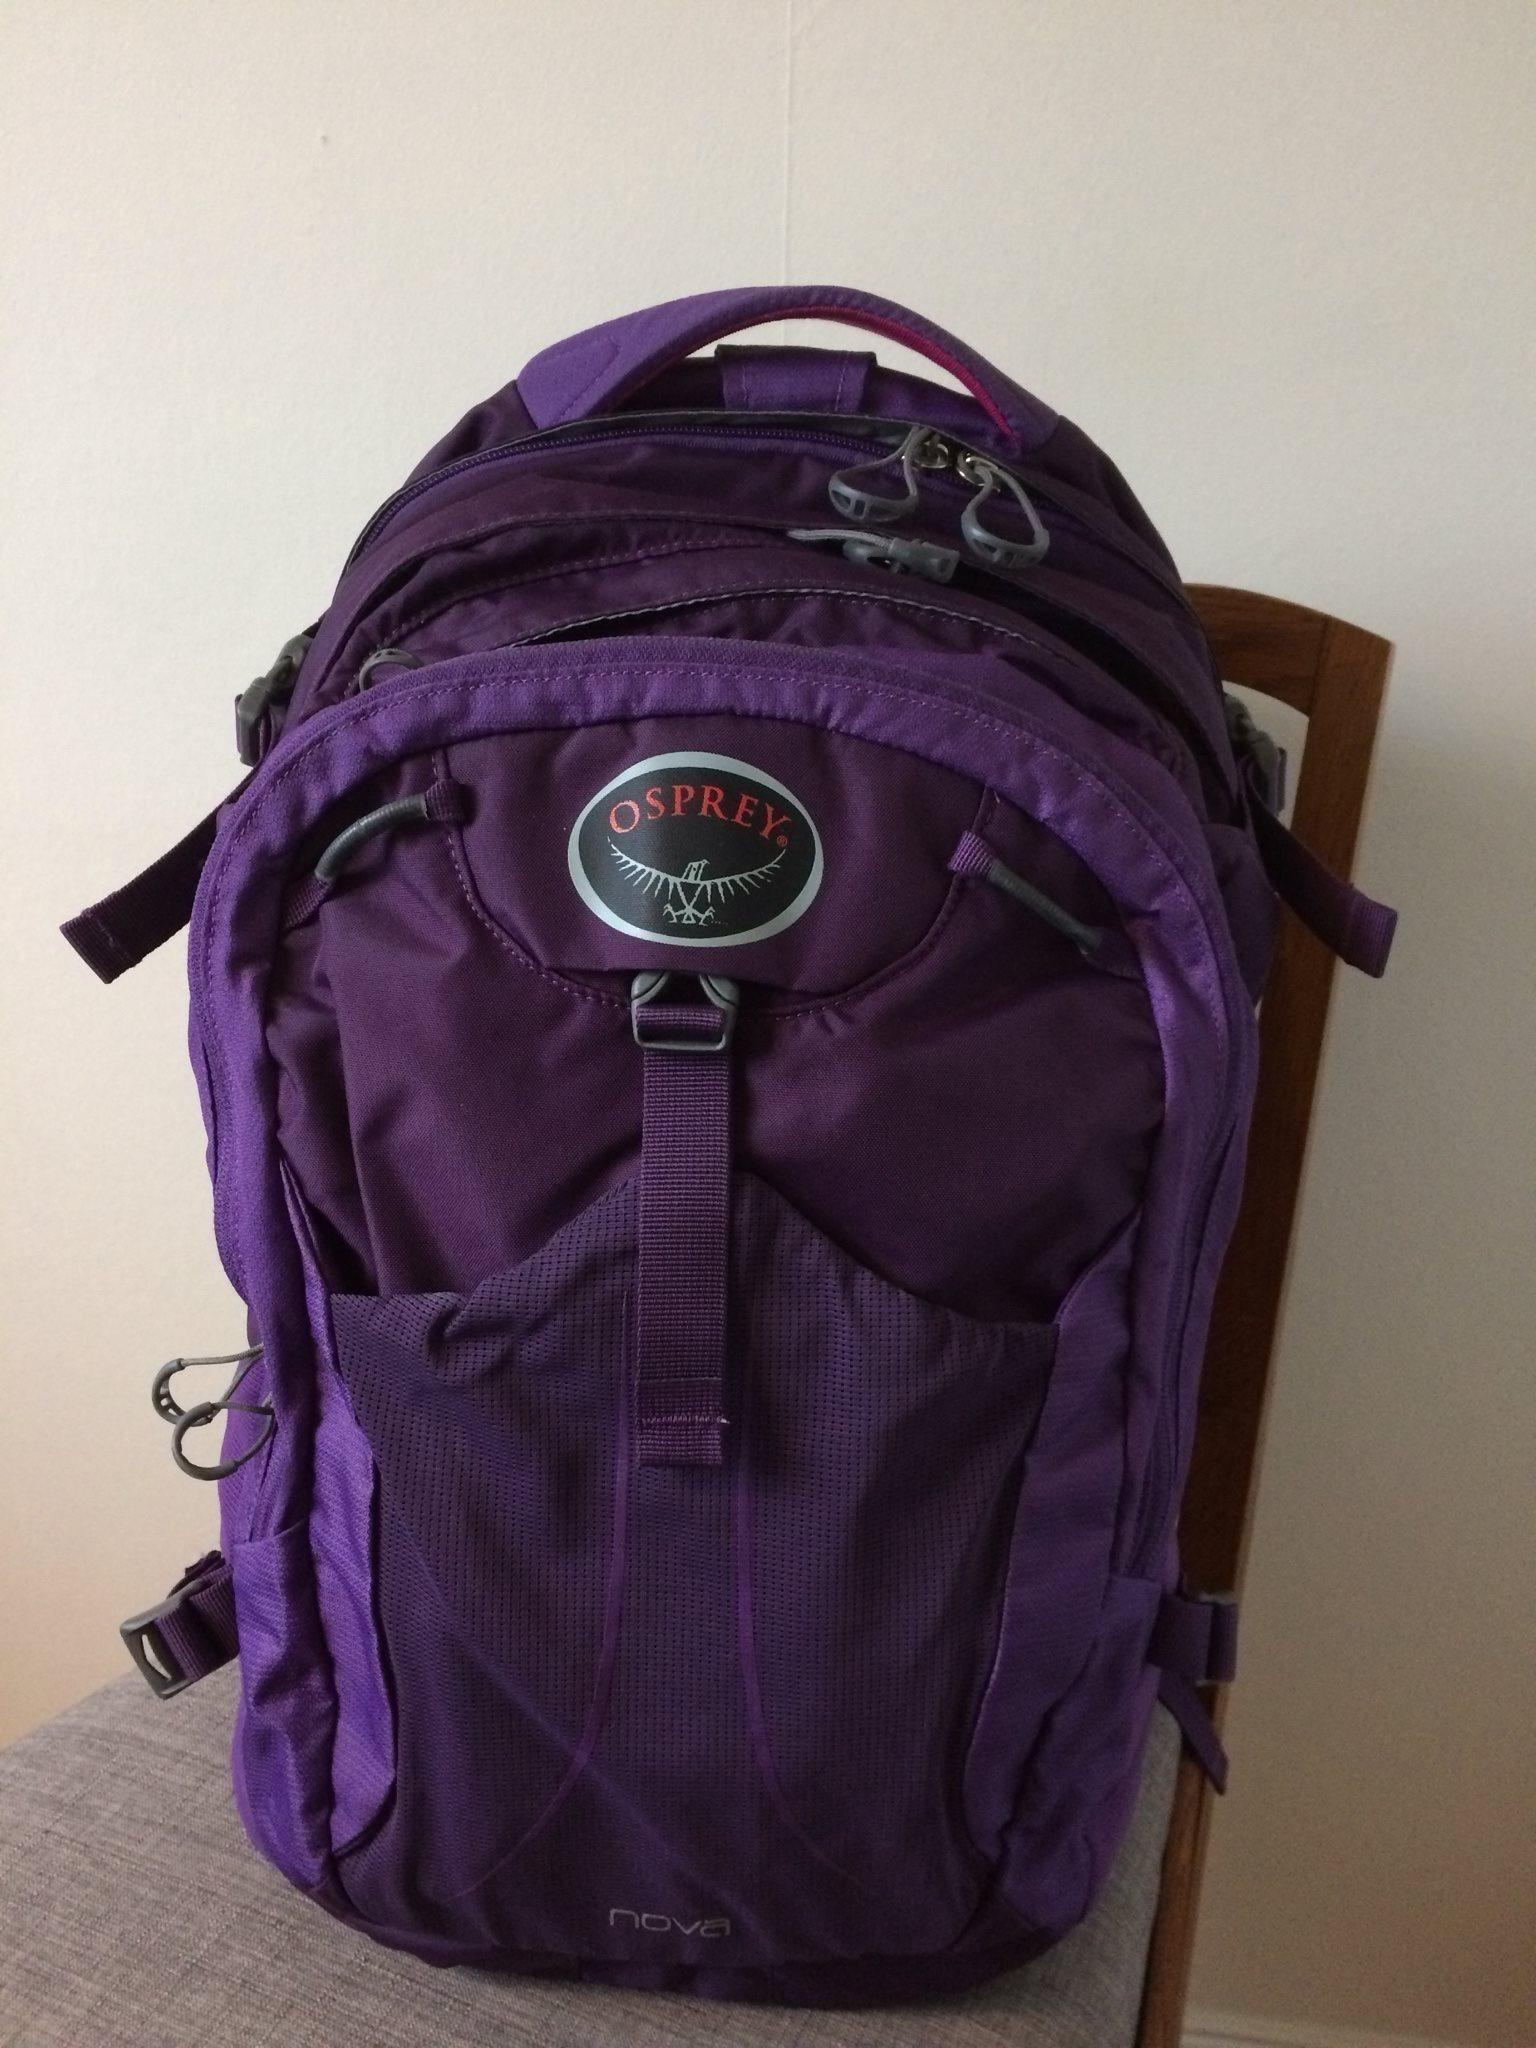 Osprey Nova 30 liter laptop lila ryggsäck (341738603) ᐈ Köp på Tradera e4b30bb30406d